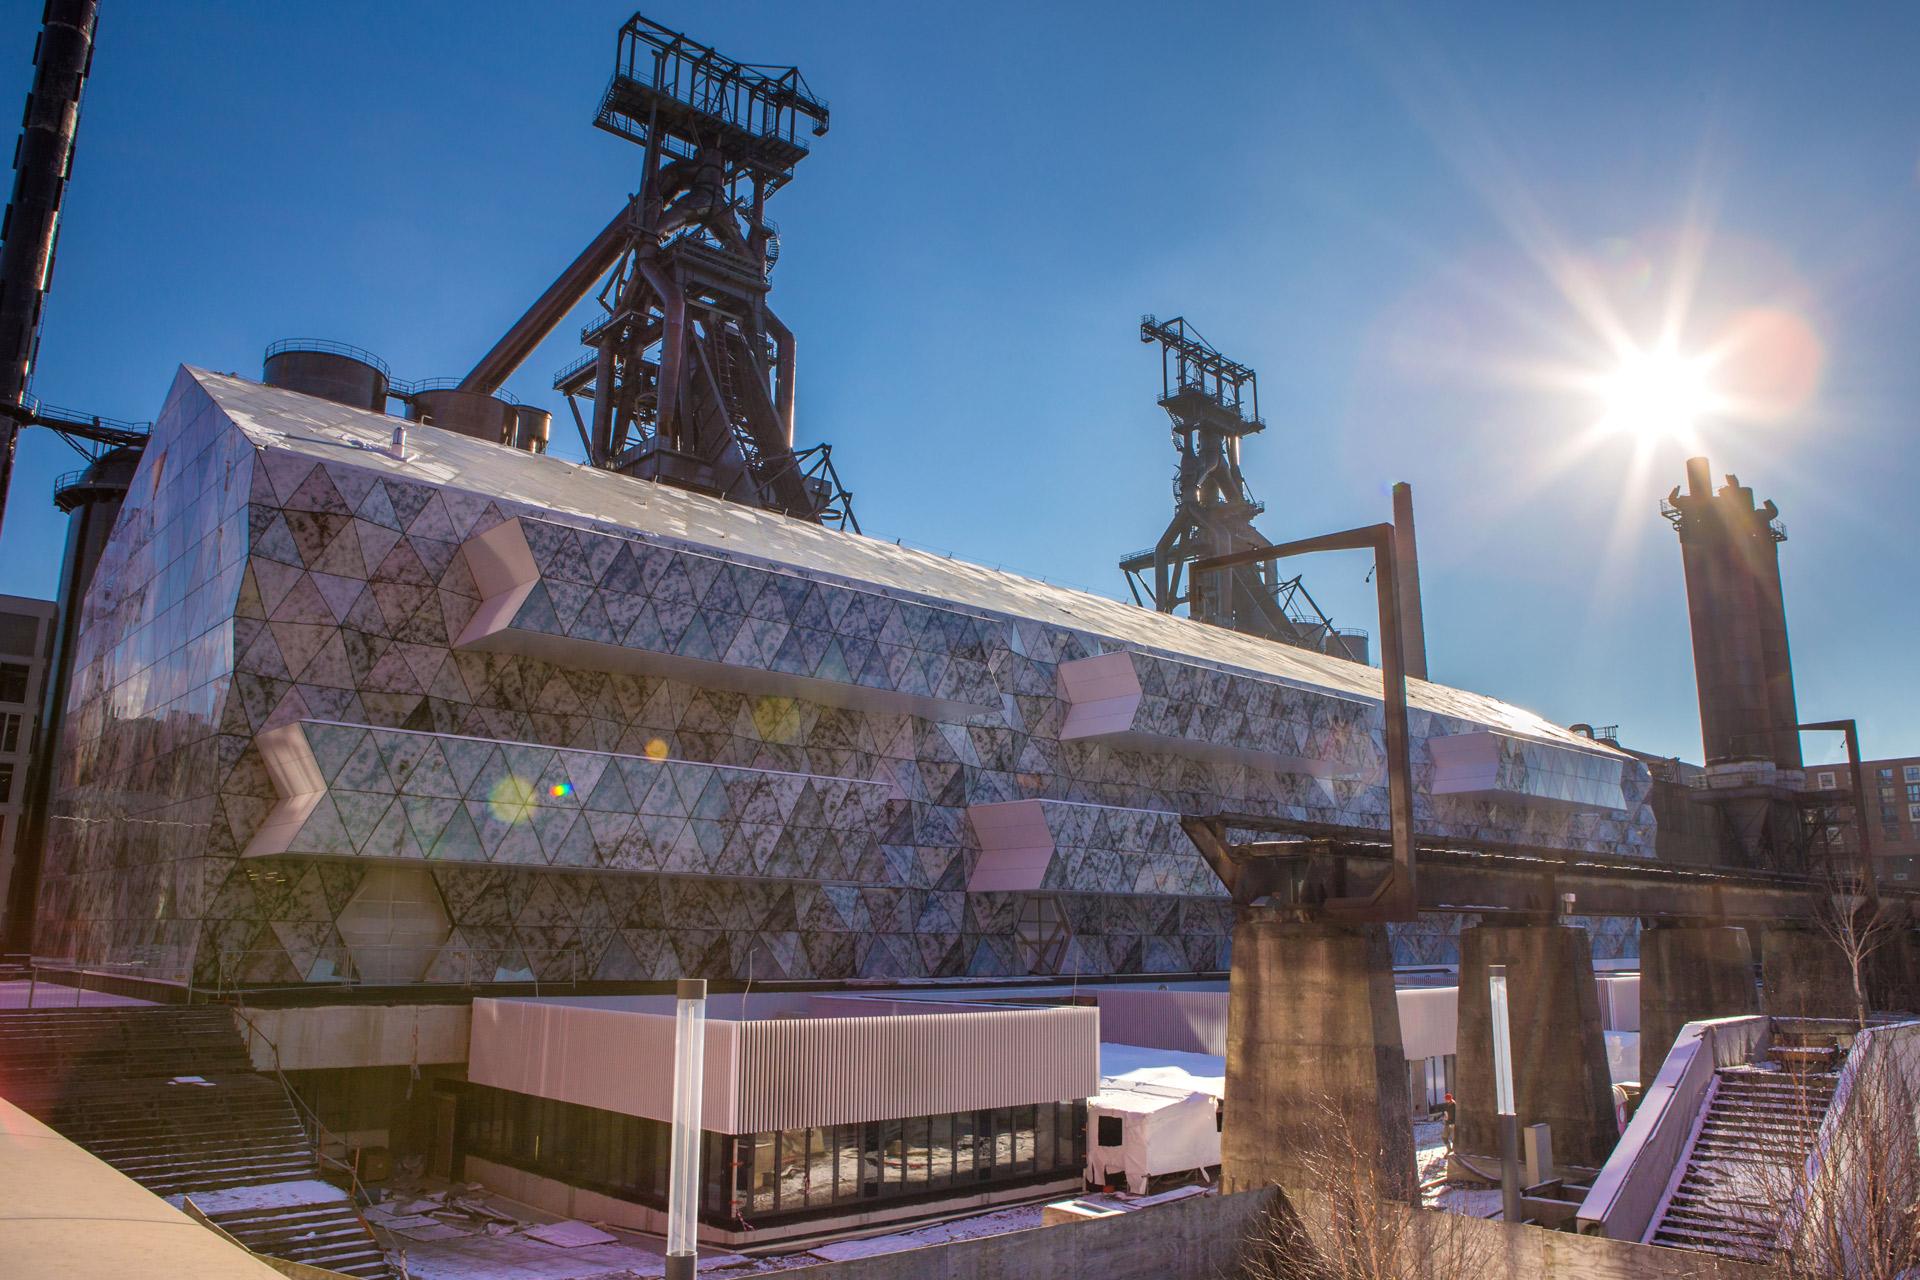 ATENOR Projet Naos Belval Vue Industrielle